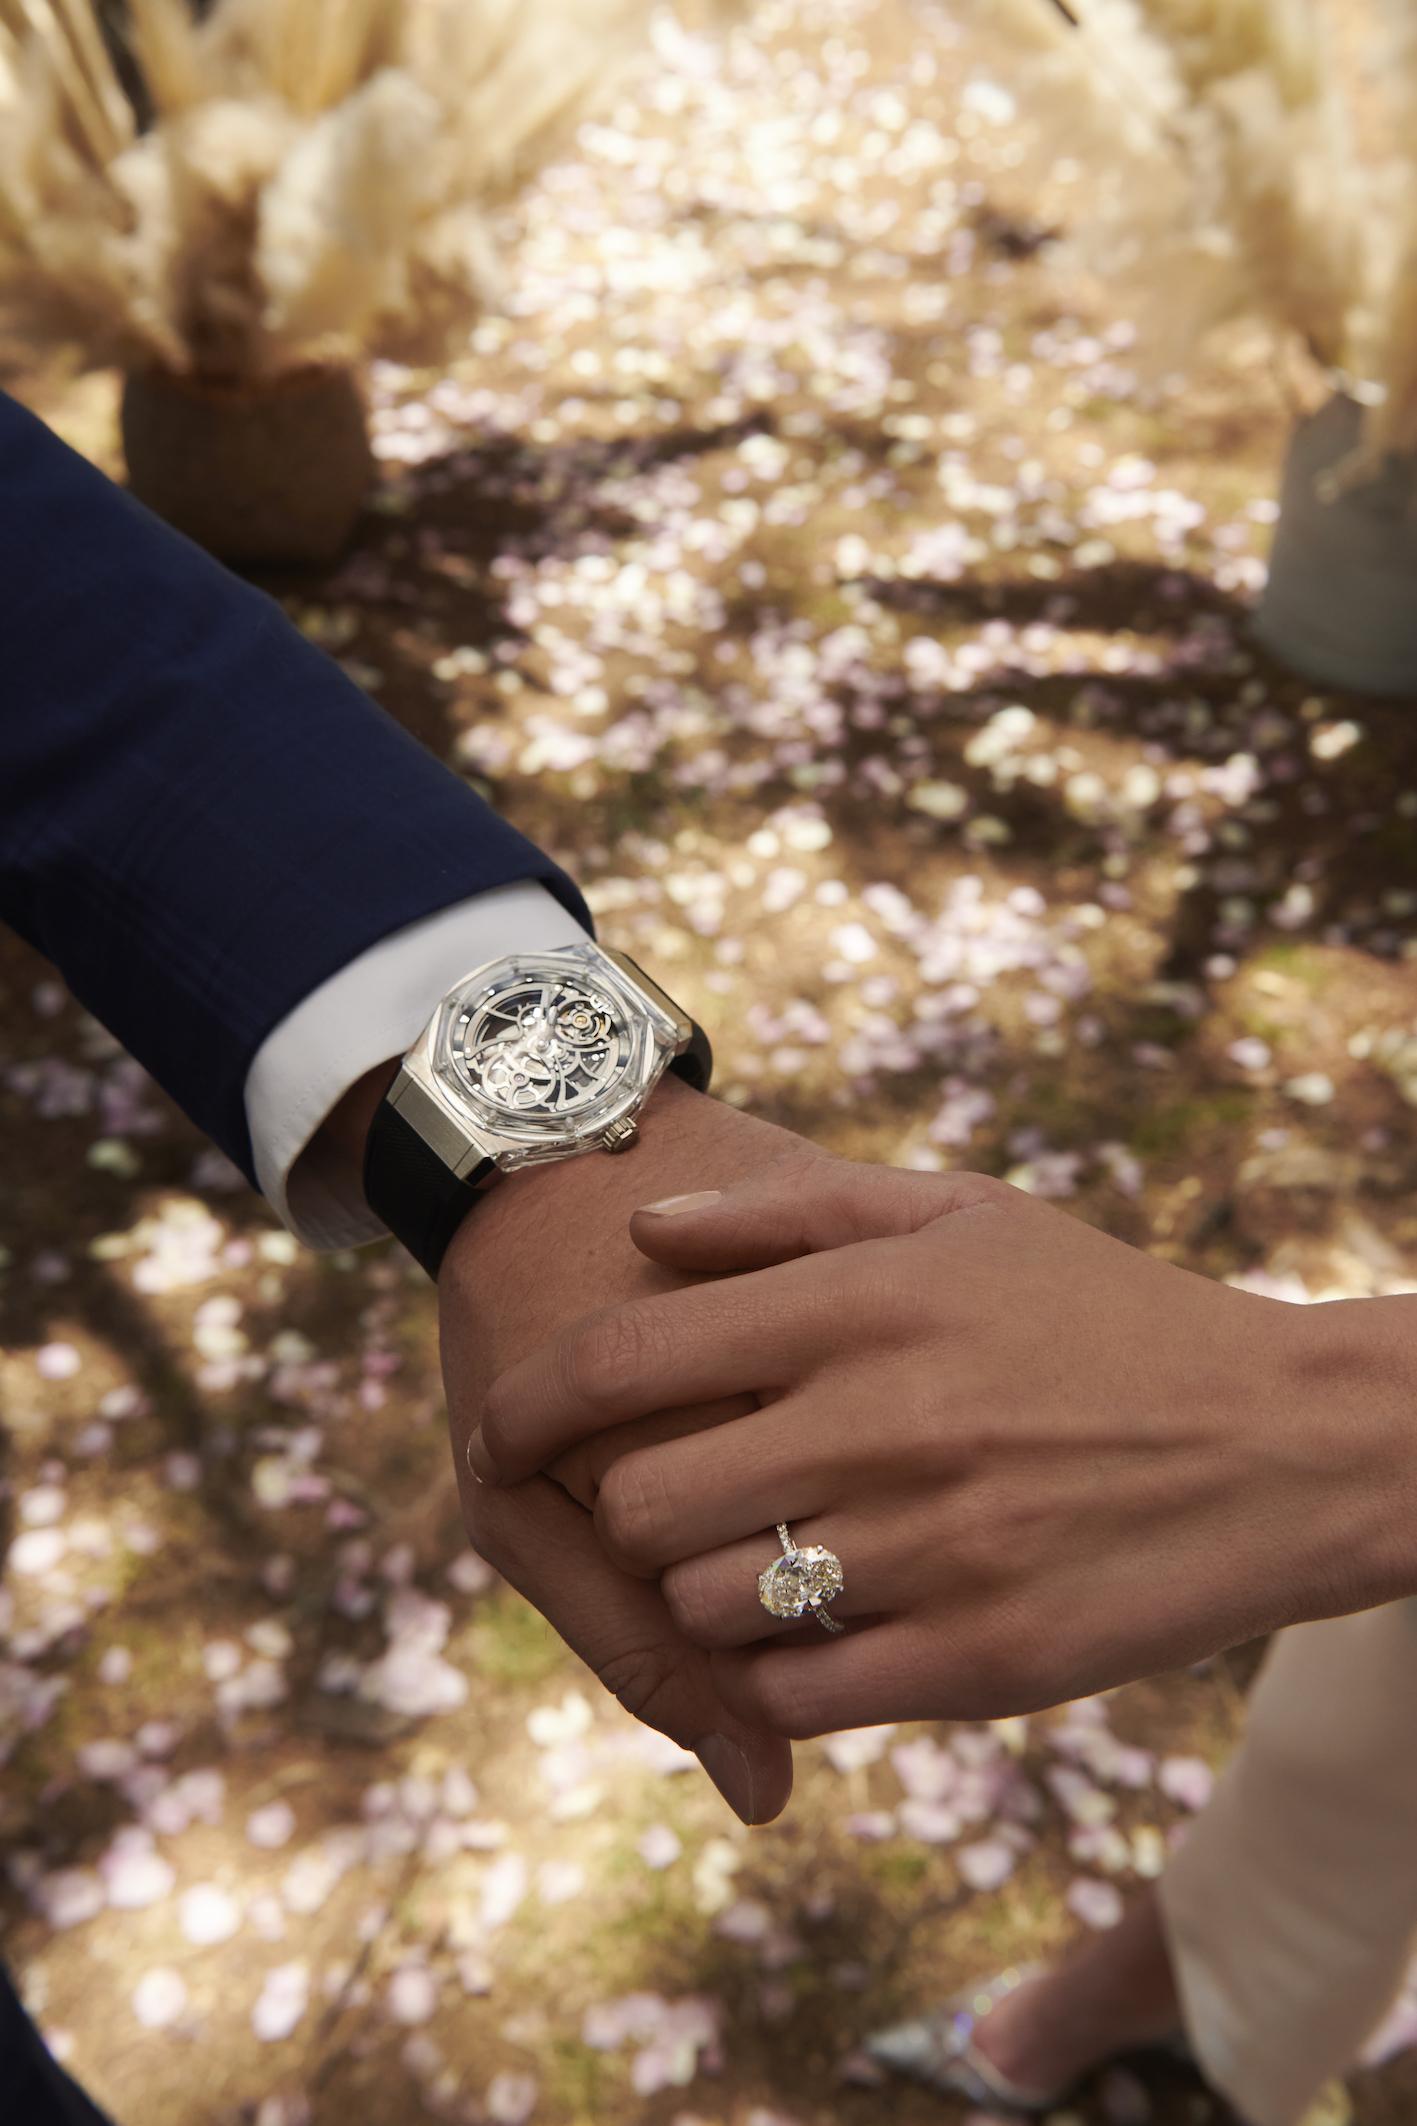 Girard-Perregaux Laureato Absolute Light Ref. 81071-43-231-FB6A y anillo diamante oval en oro blanco copia